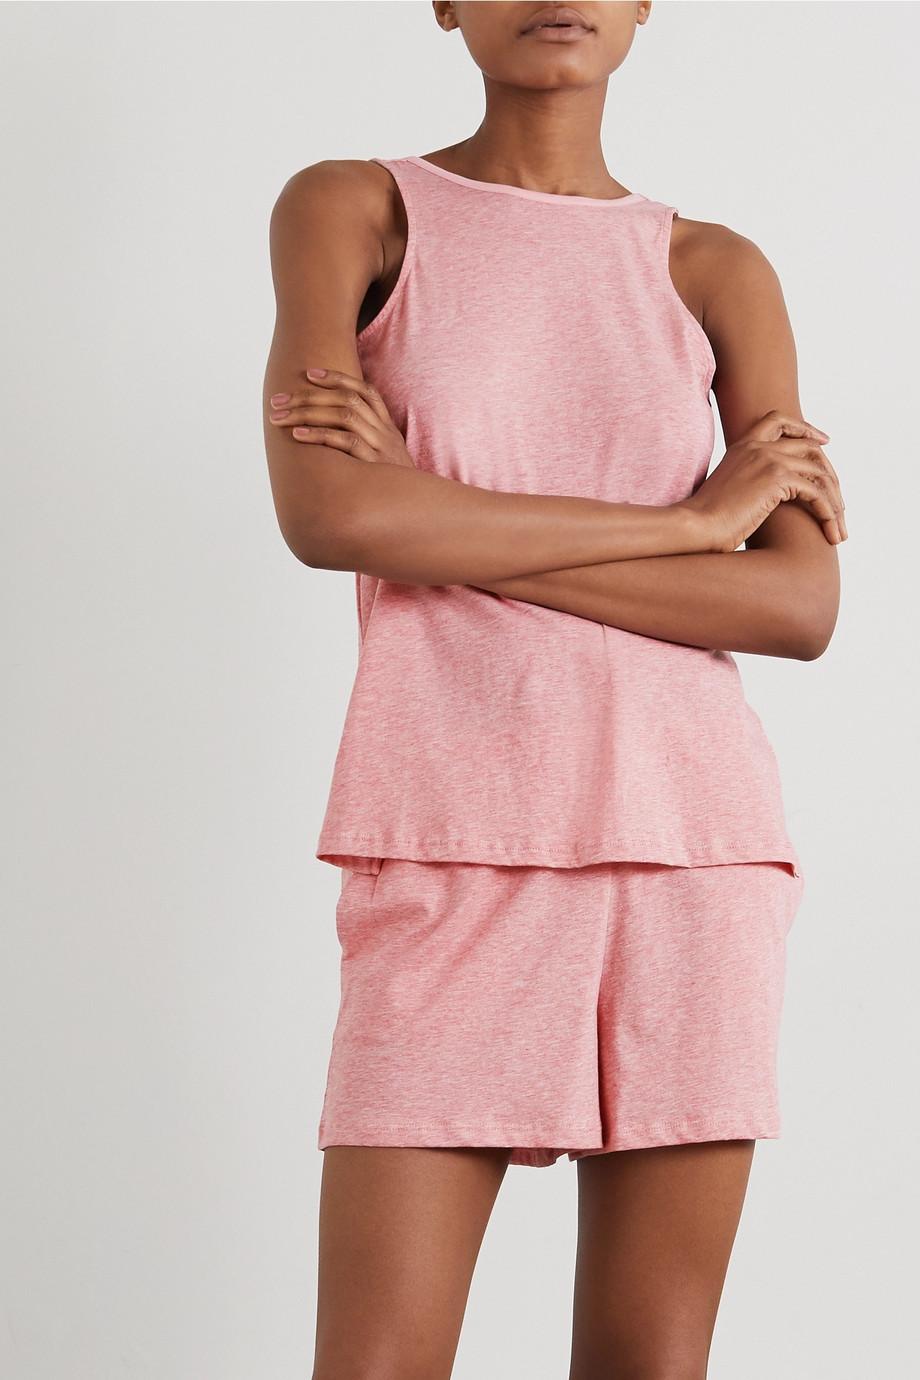 Skin Carlee mélange Pima cotton-jersey shorts